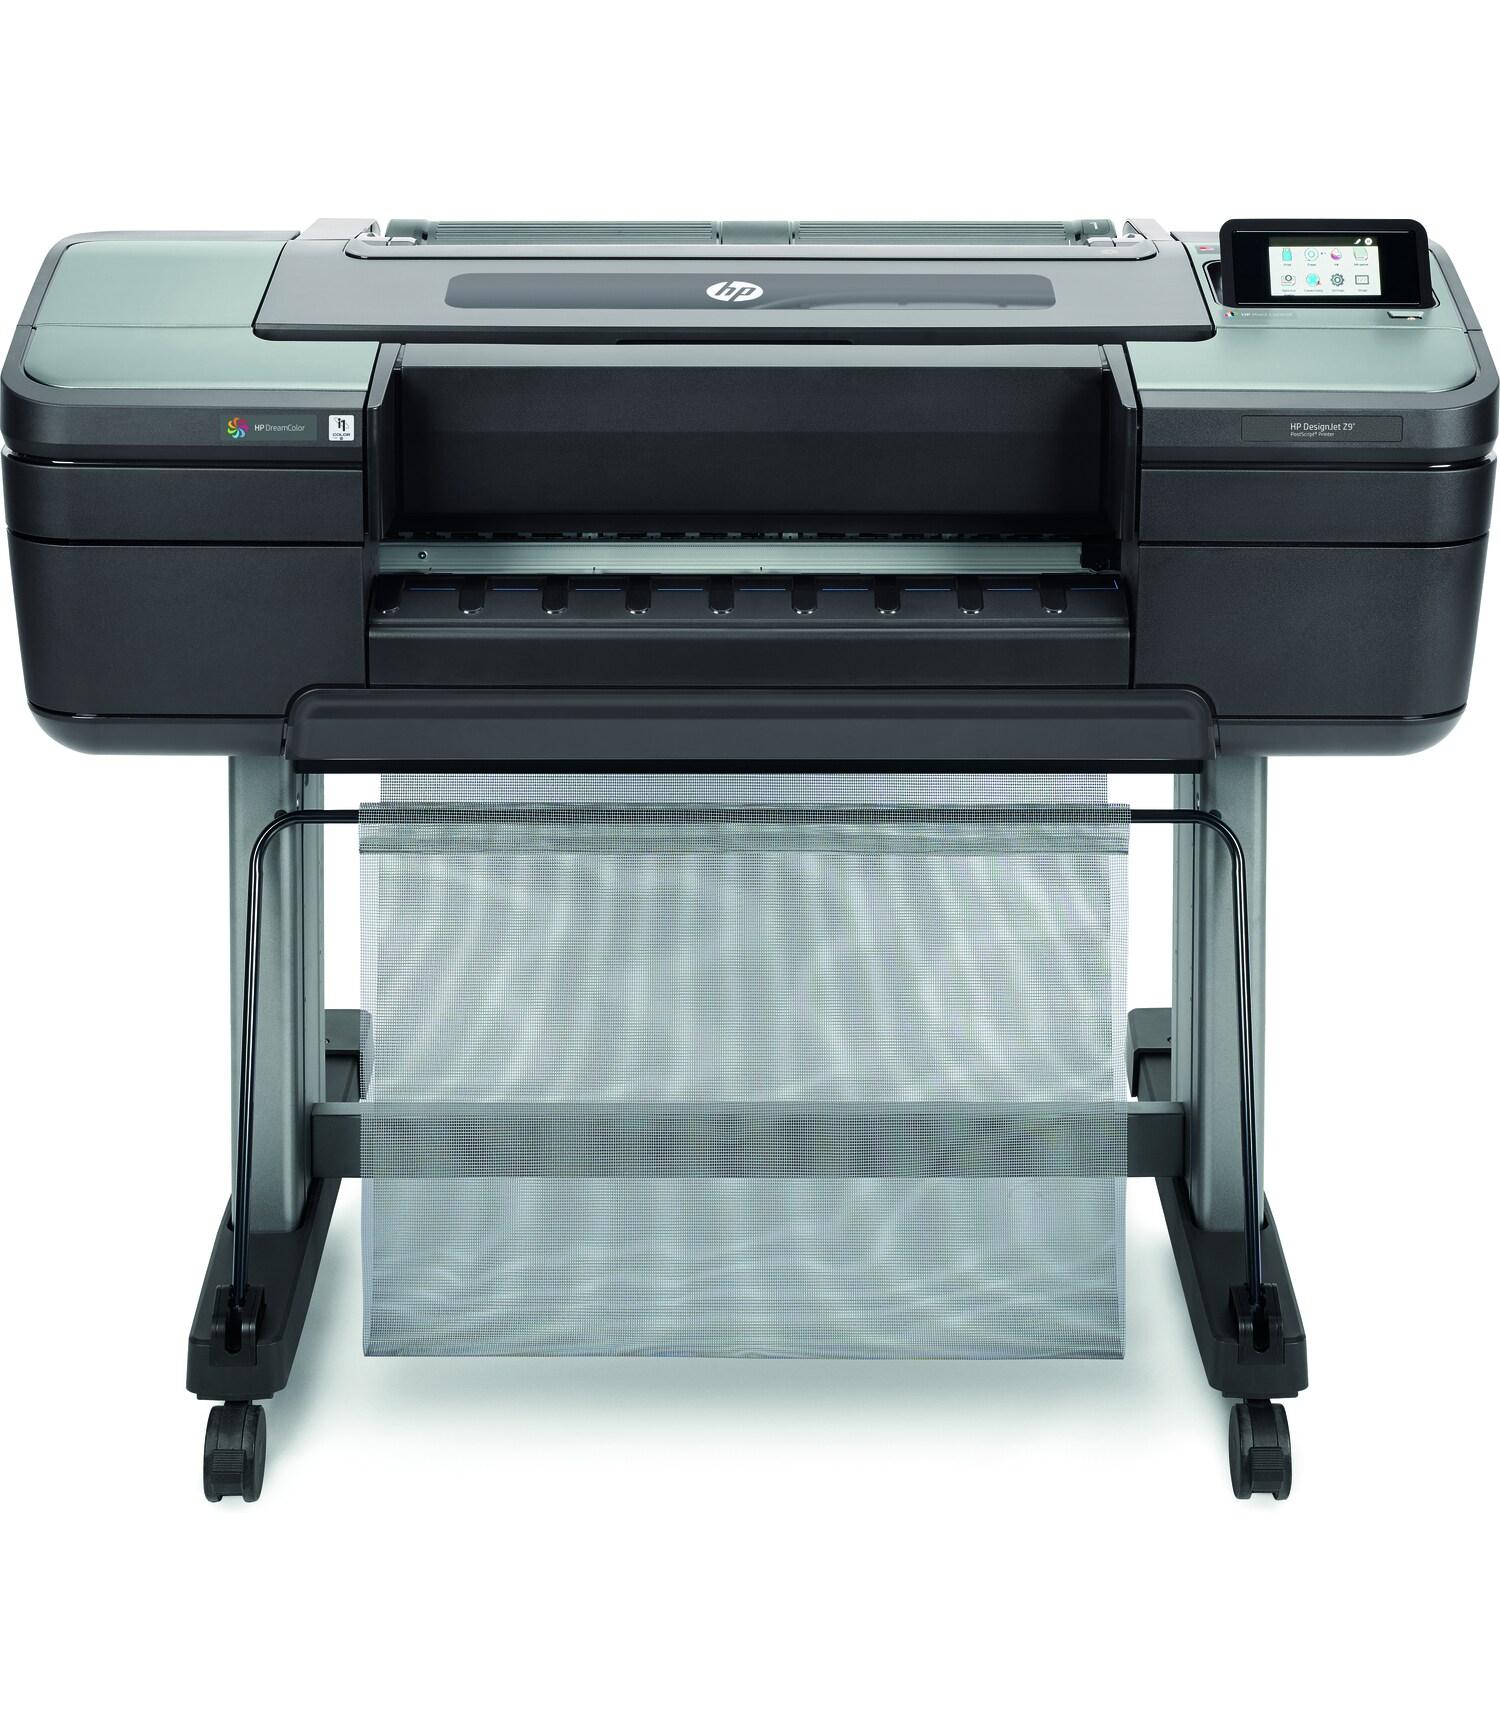 Impressora Plotter Designjet Z9 24 Polegadas PostScript W3Z71A HP 26334